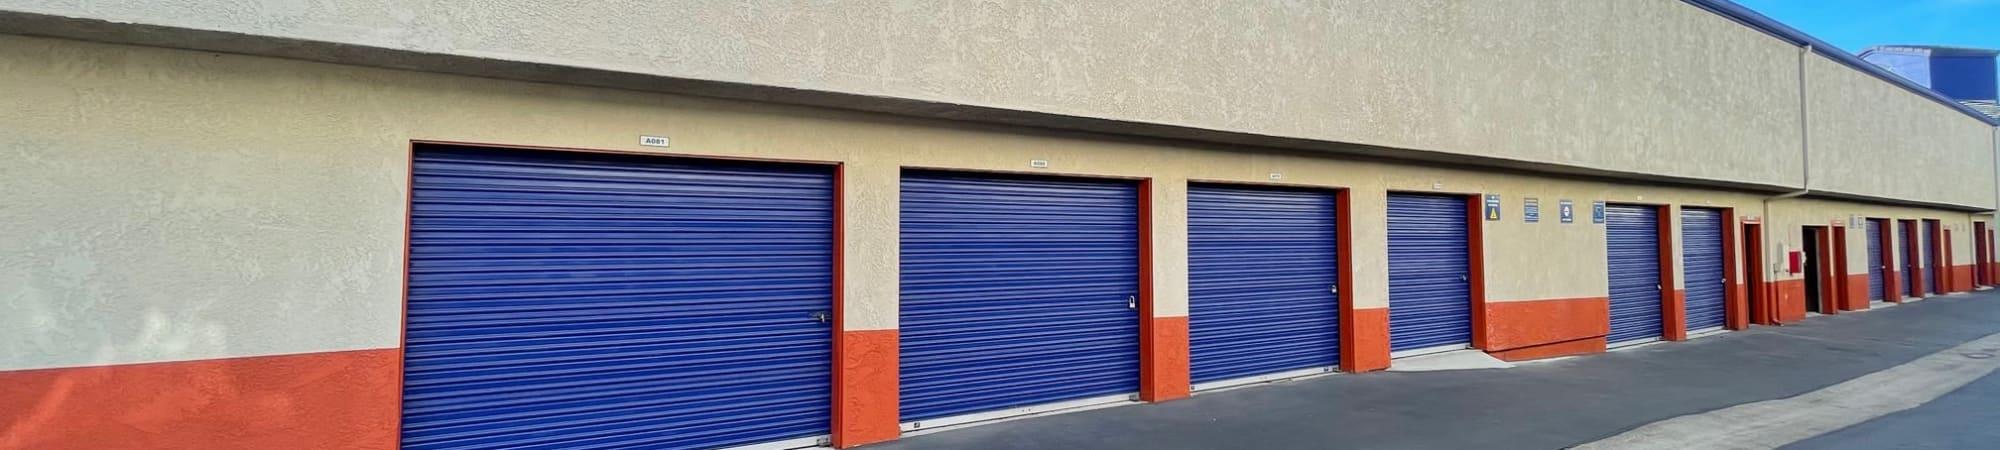 Storage Solutions storage units for rent in Capistrano Beach, California